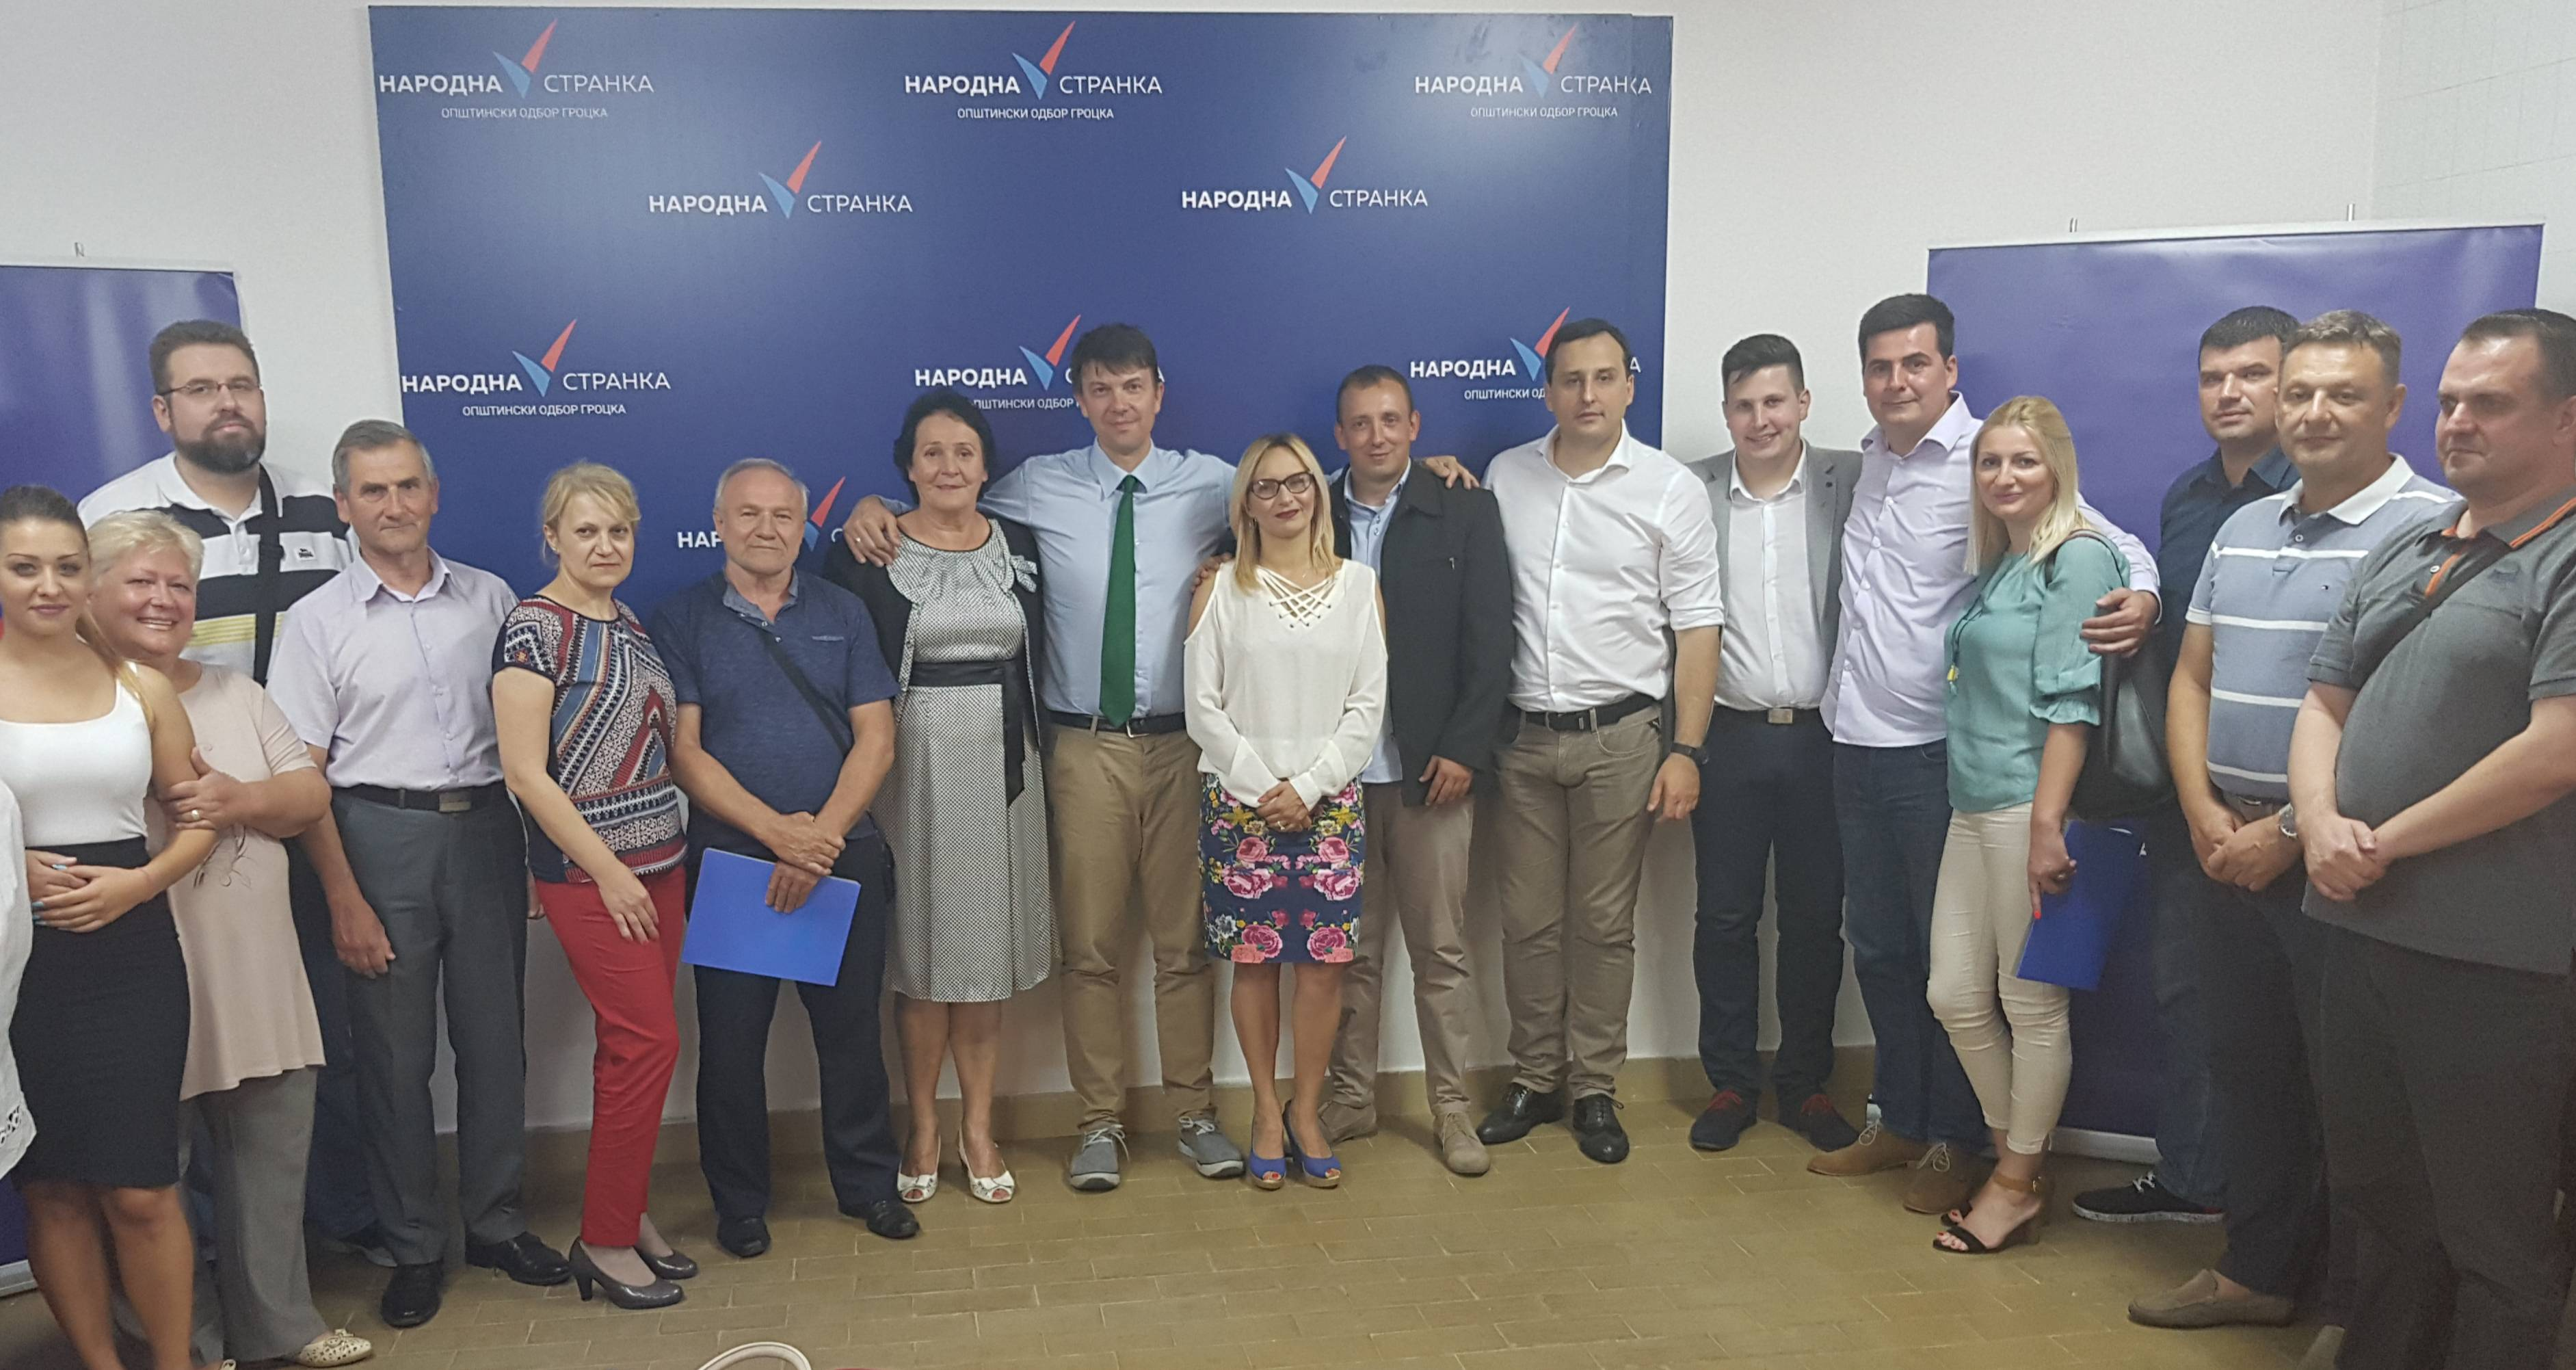 Београд: Основан Општински одбор Народне странке Гроцка